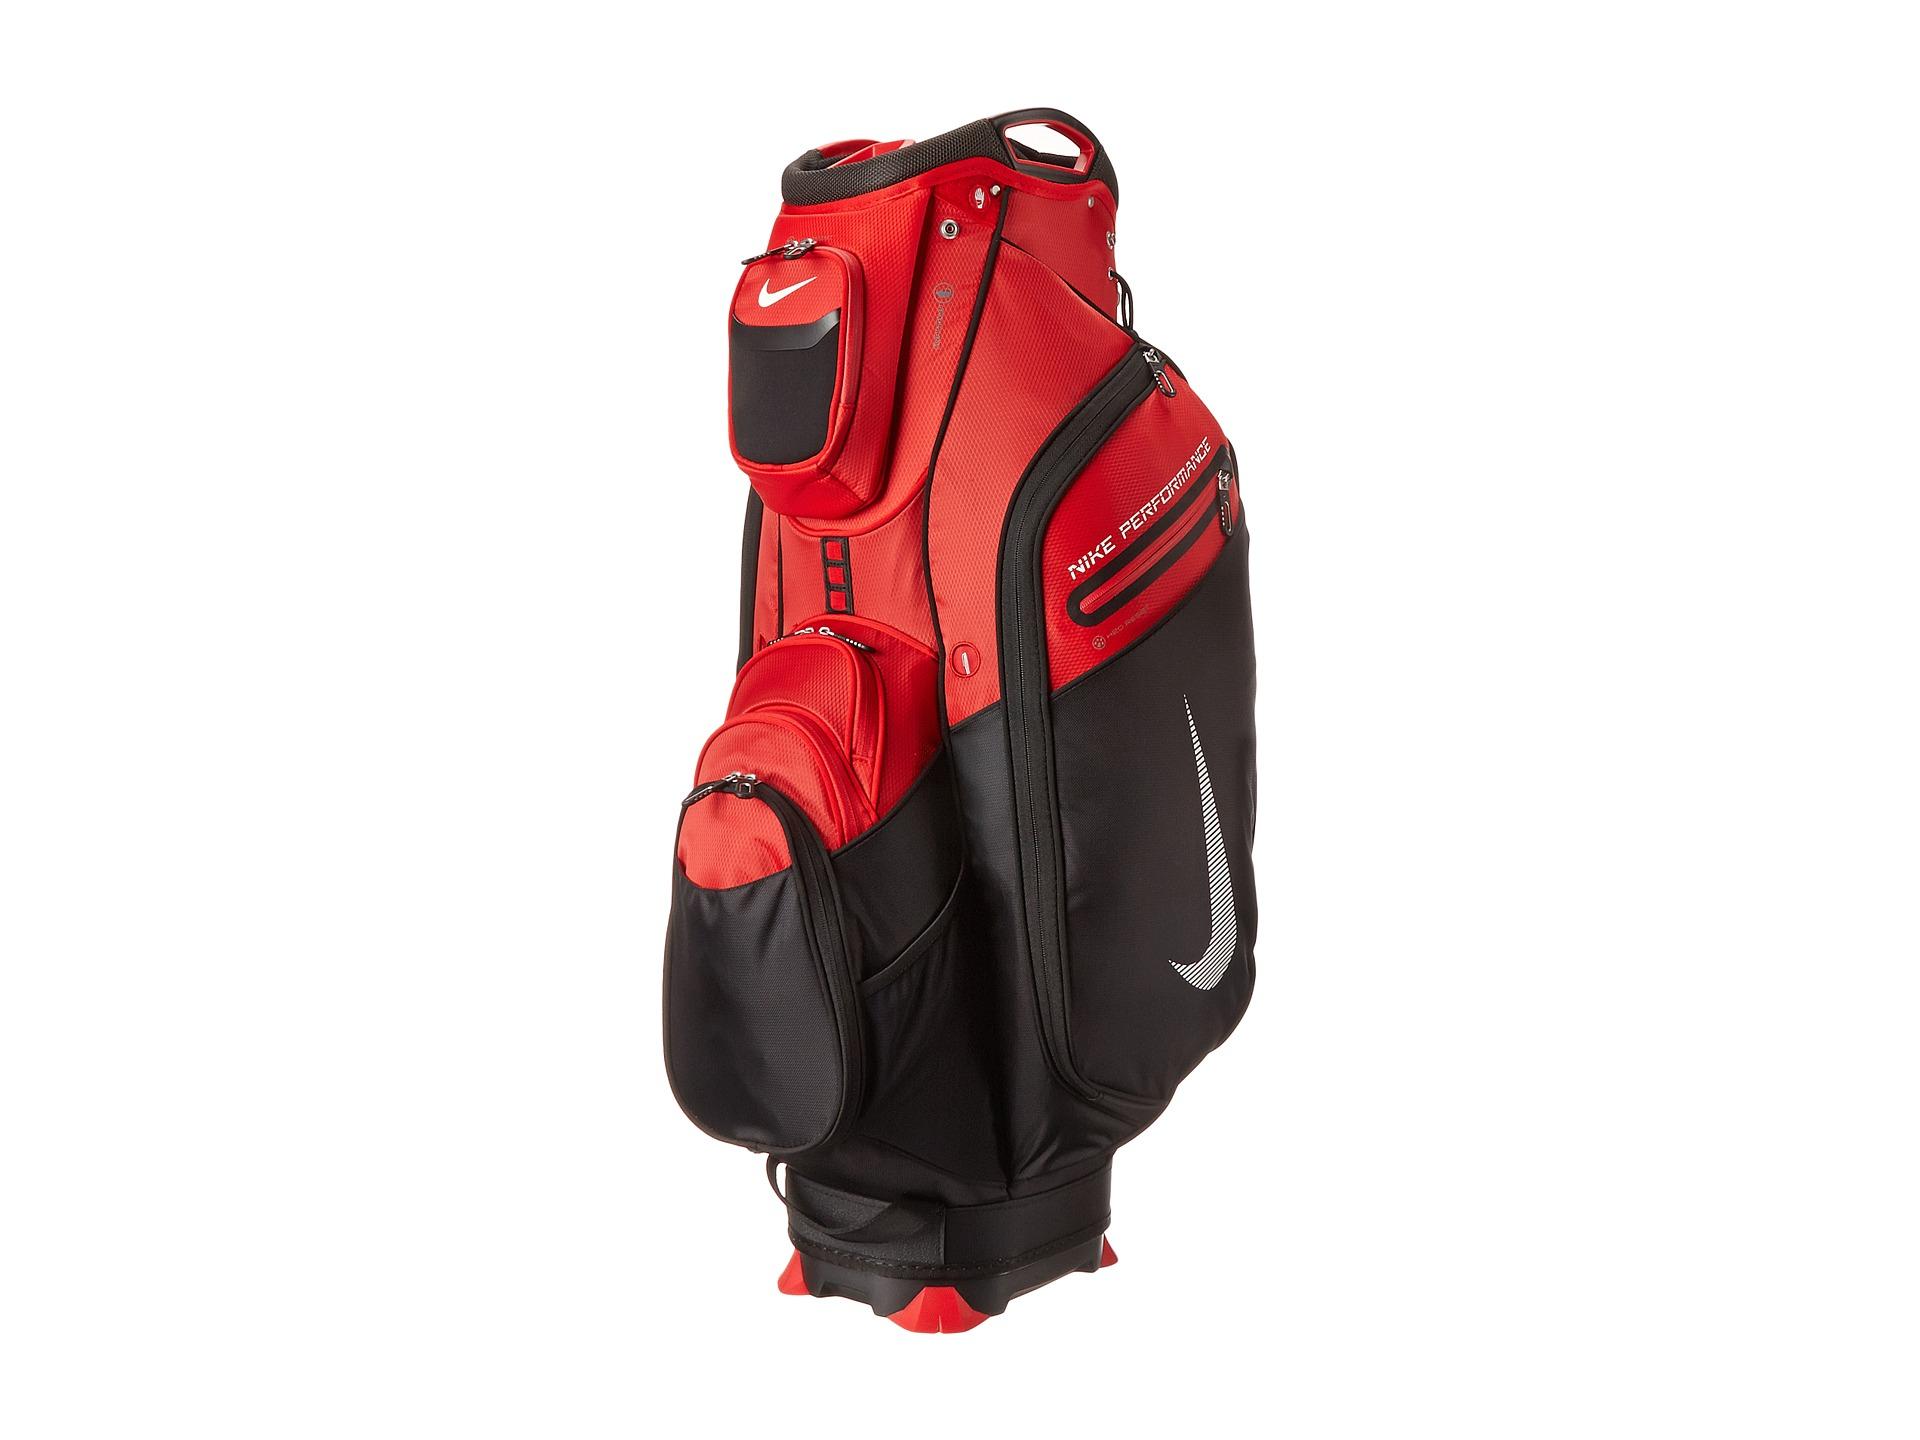 Red And Black Nike Golf Bag  Amazon nike sport iii golf duffle bag ... 102cde9d74d88